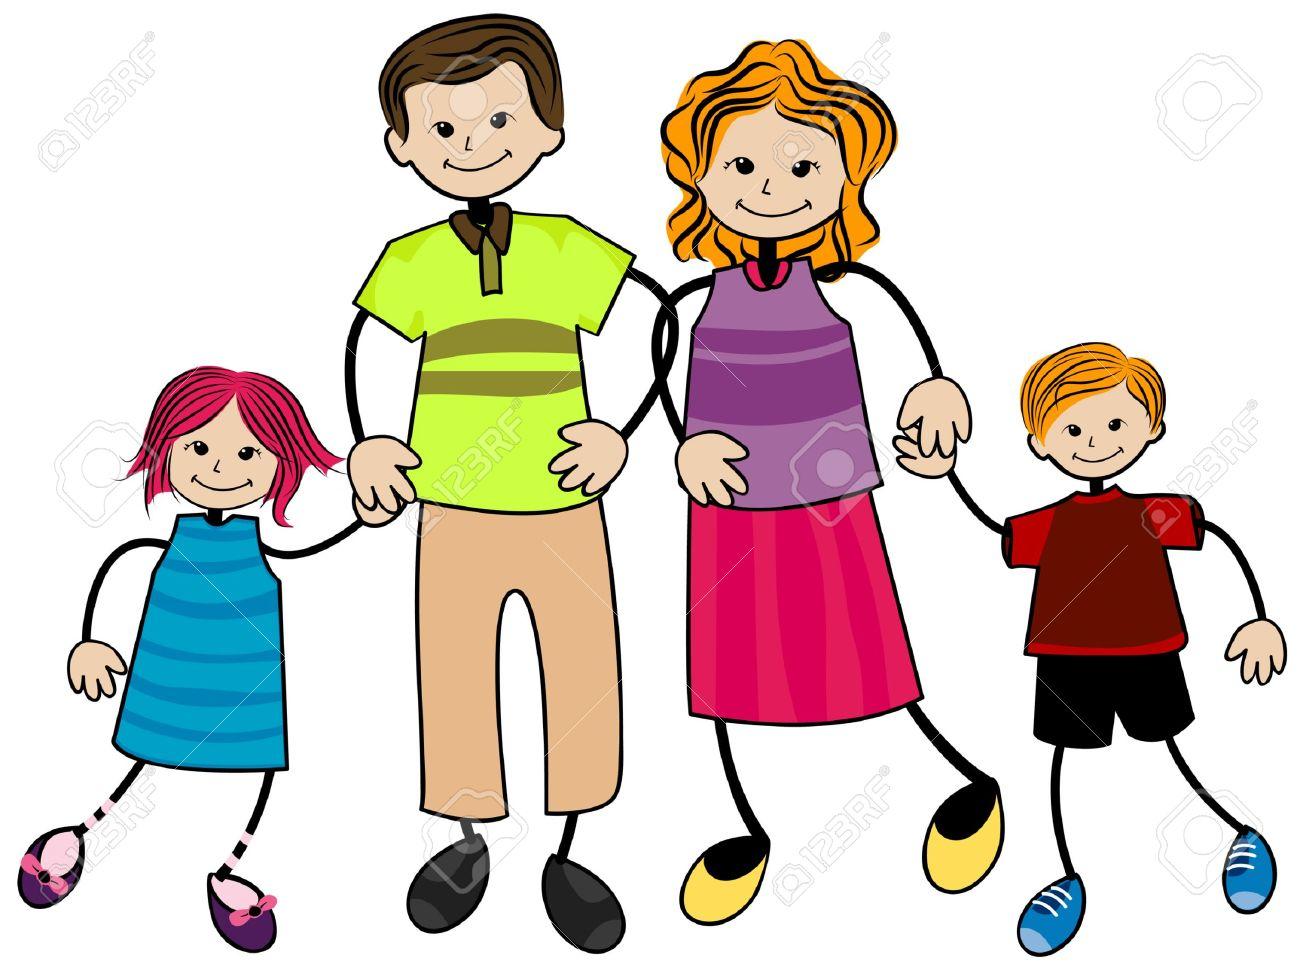 family clipart-family clipart-8